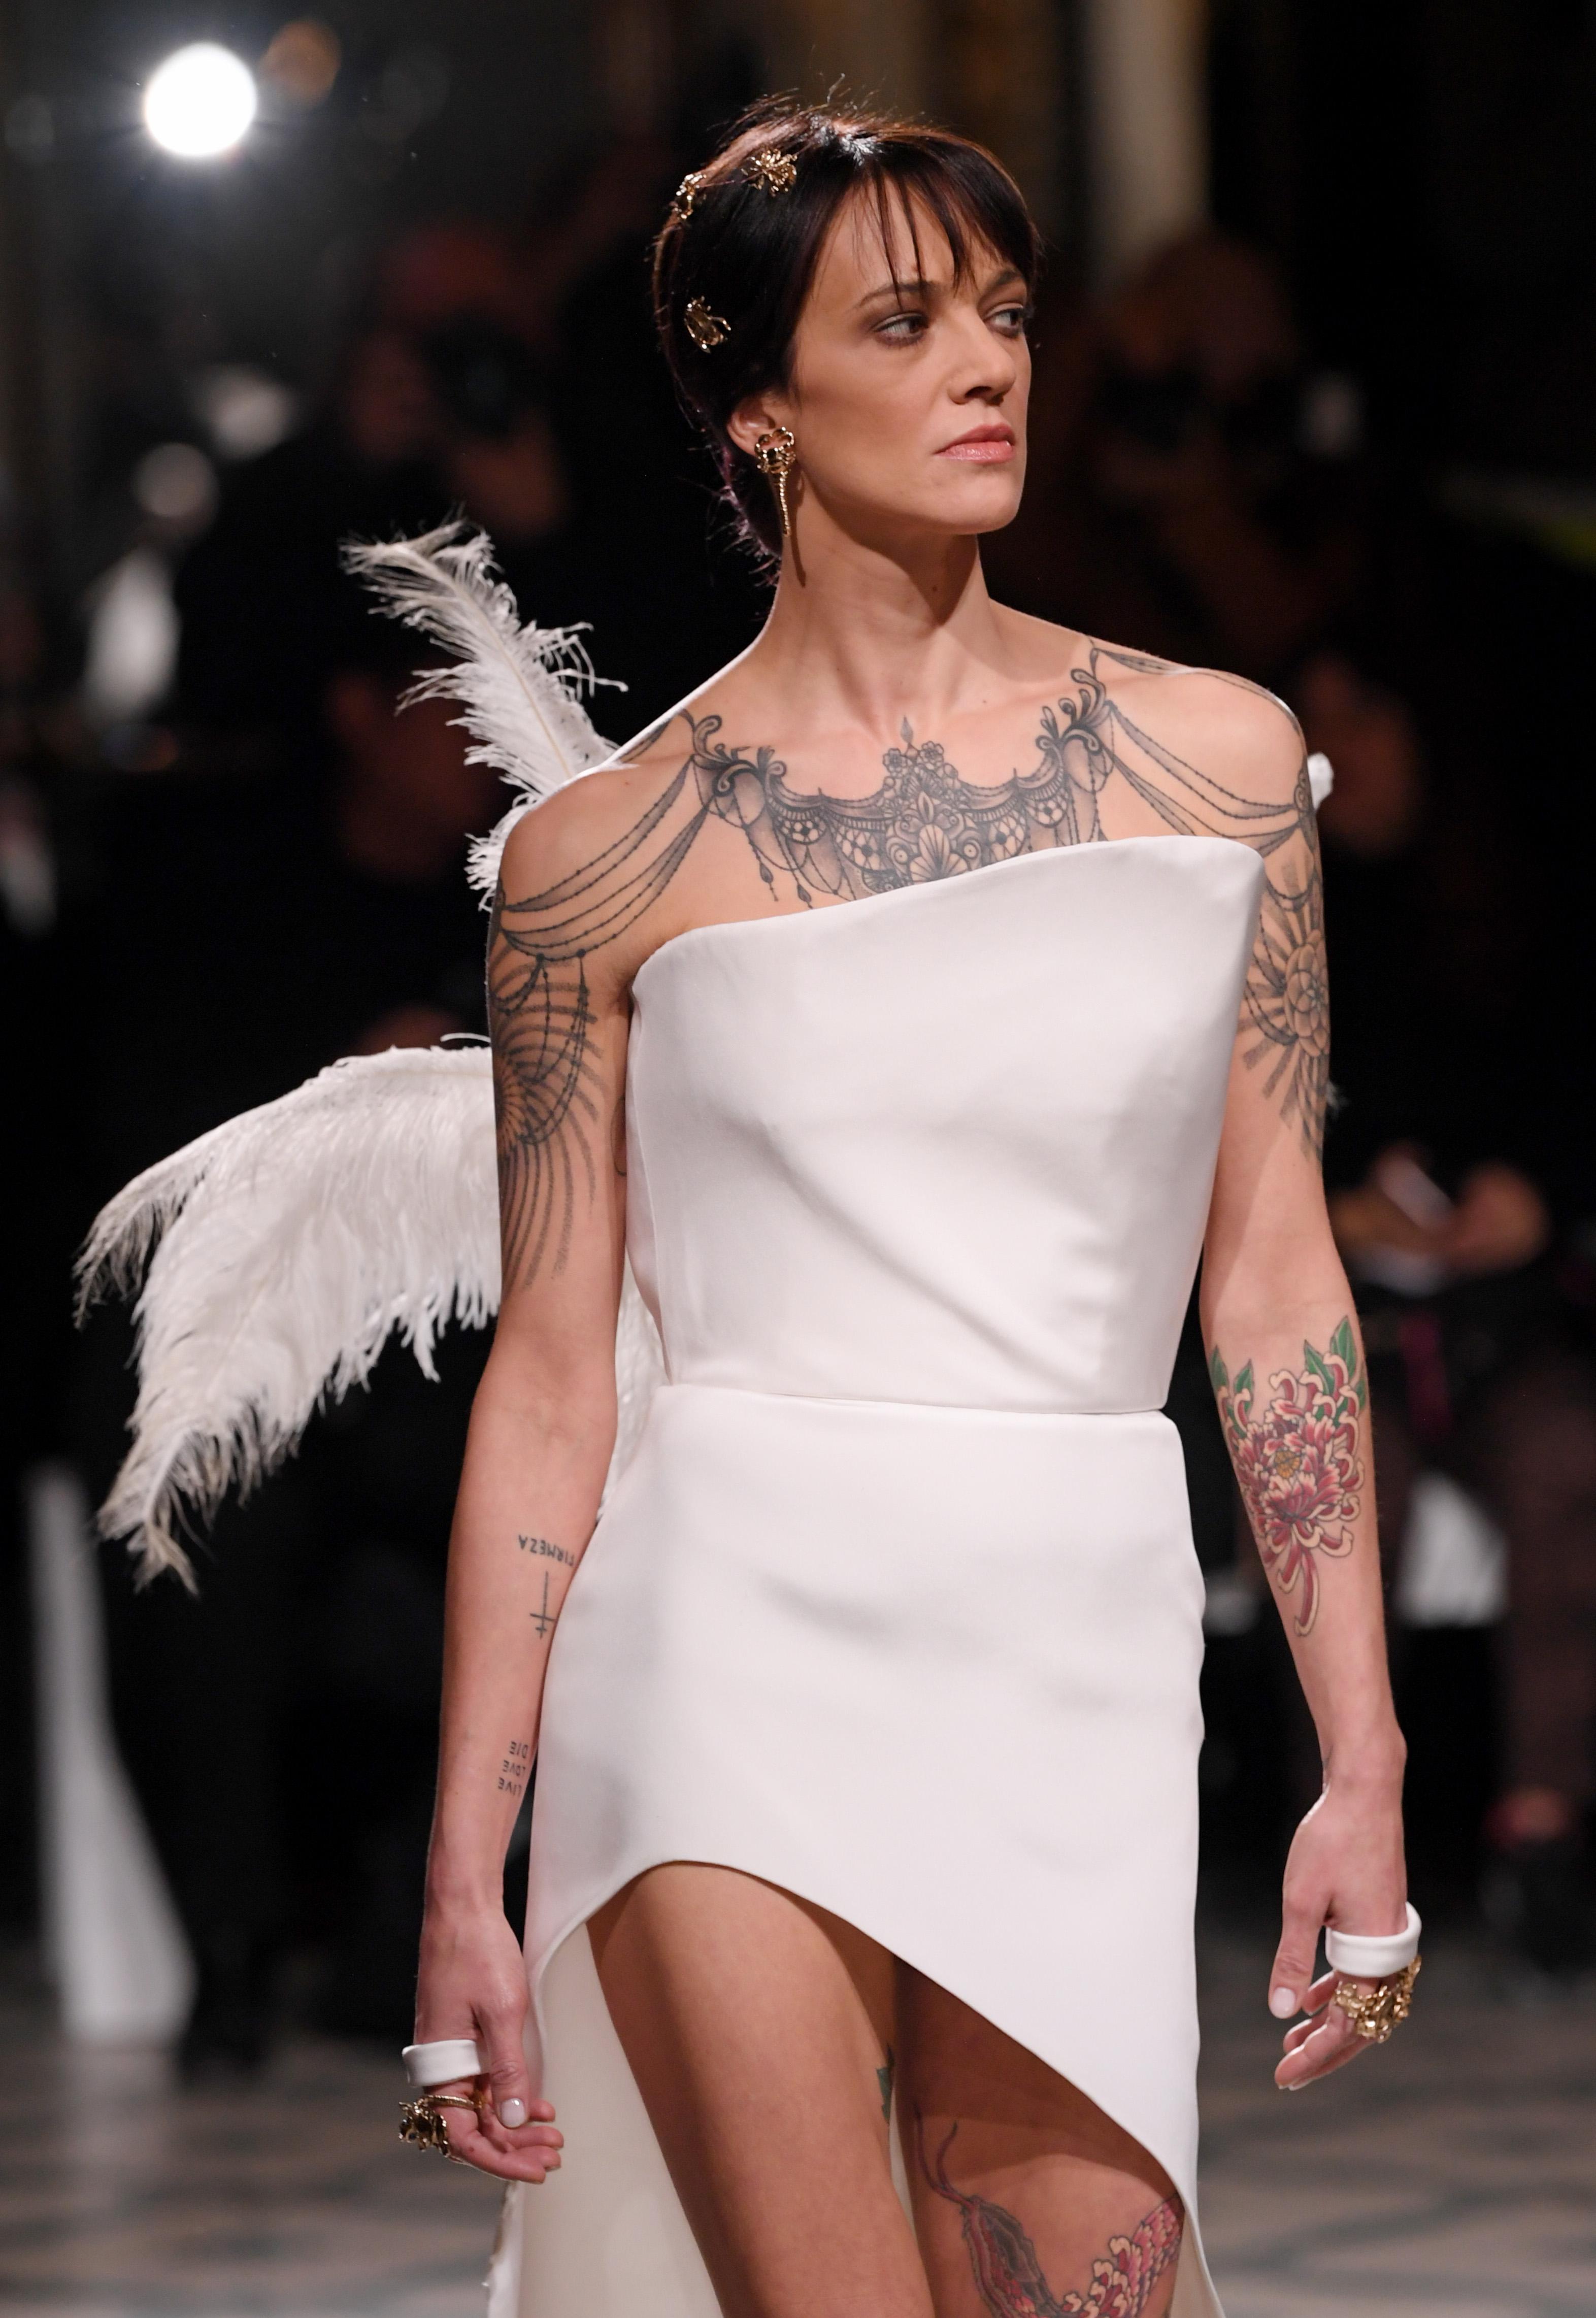 Asia Argento on the catwalkAntonio Grimaldi show, Runway, Spring Summer 2019, Haute Couture Fashion Week, Paris, France - 21 Jan 2019